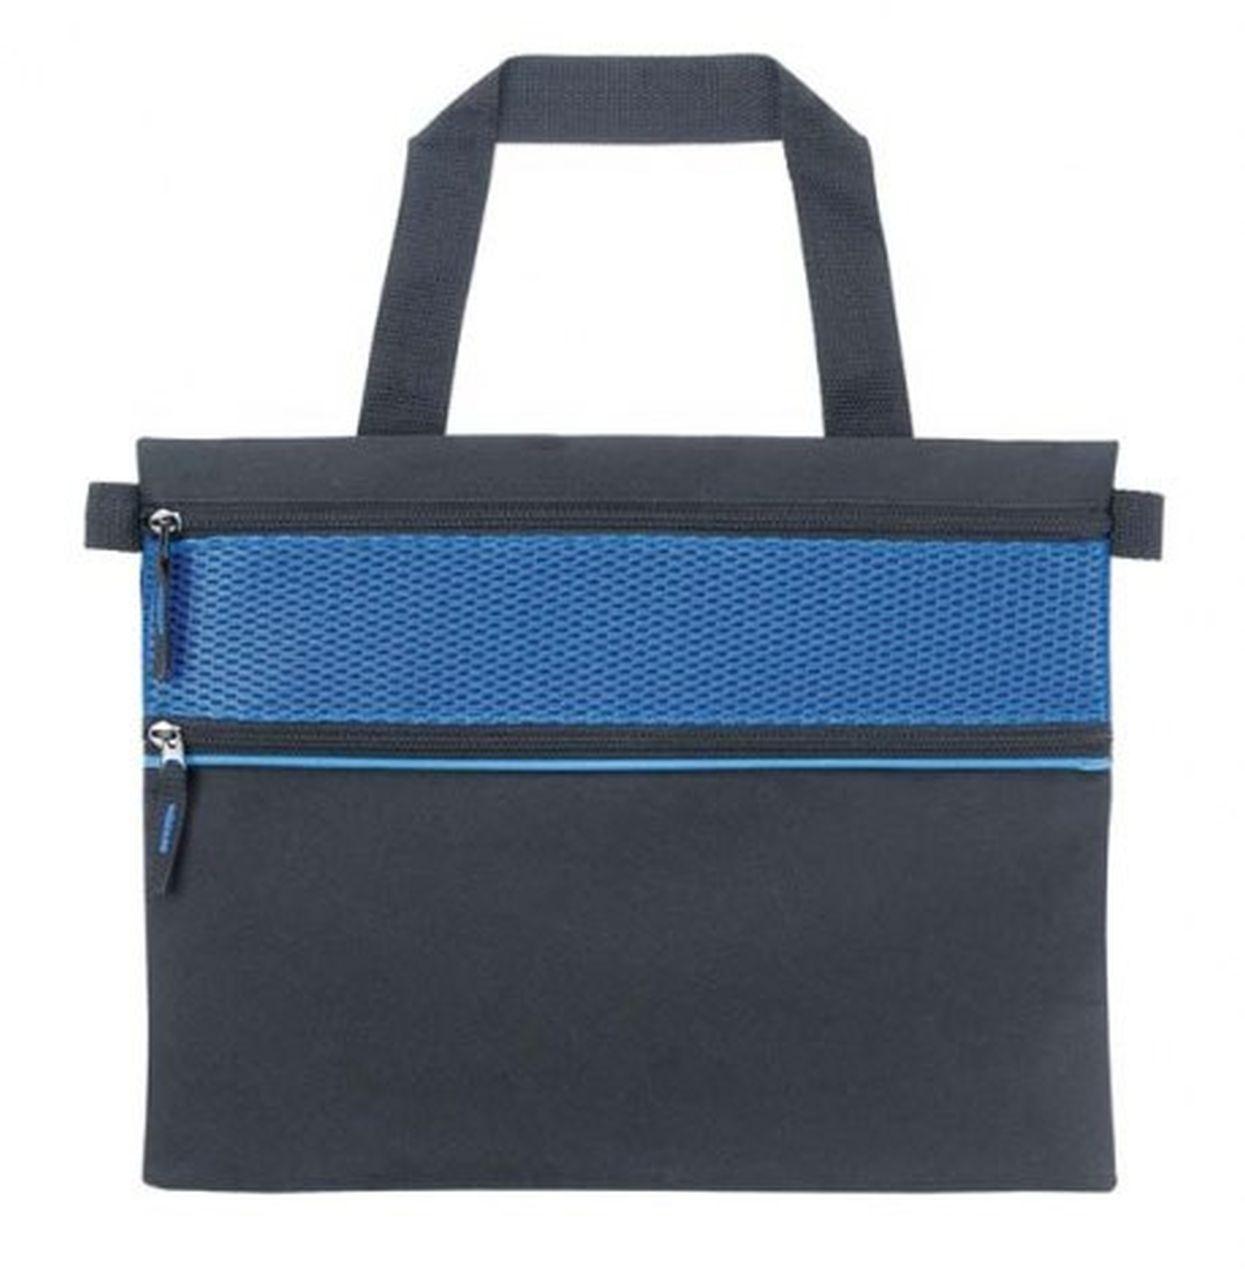 Borsa portadocumenti nera blu cm.36x1x28h